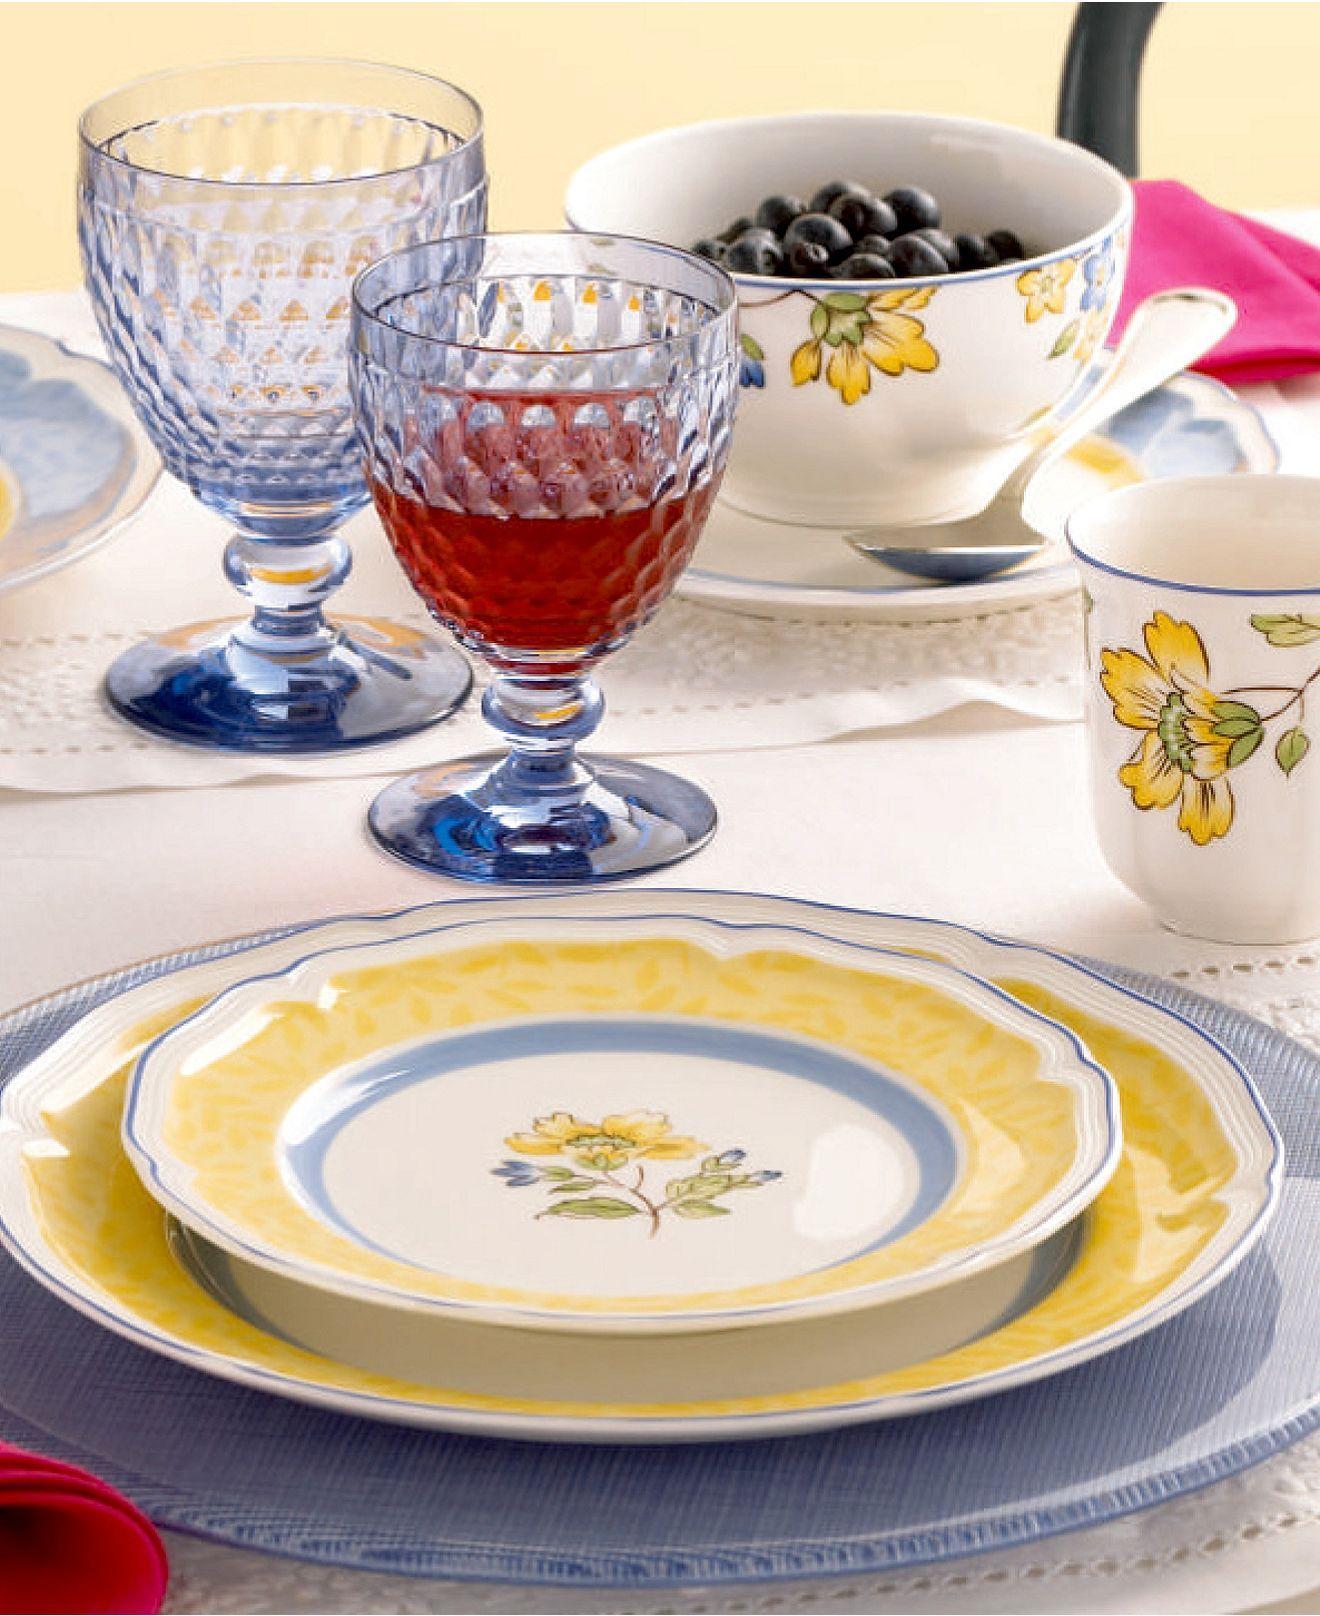 Villeroy u0026 Boch Toscana Dinnerware Collection - Casual Dinnerware - Dining u0026 Entertaining & Villeroy u0026 Boch Toscana Dinnerware Collection - Casual Dinnerware ...